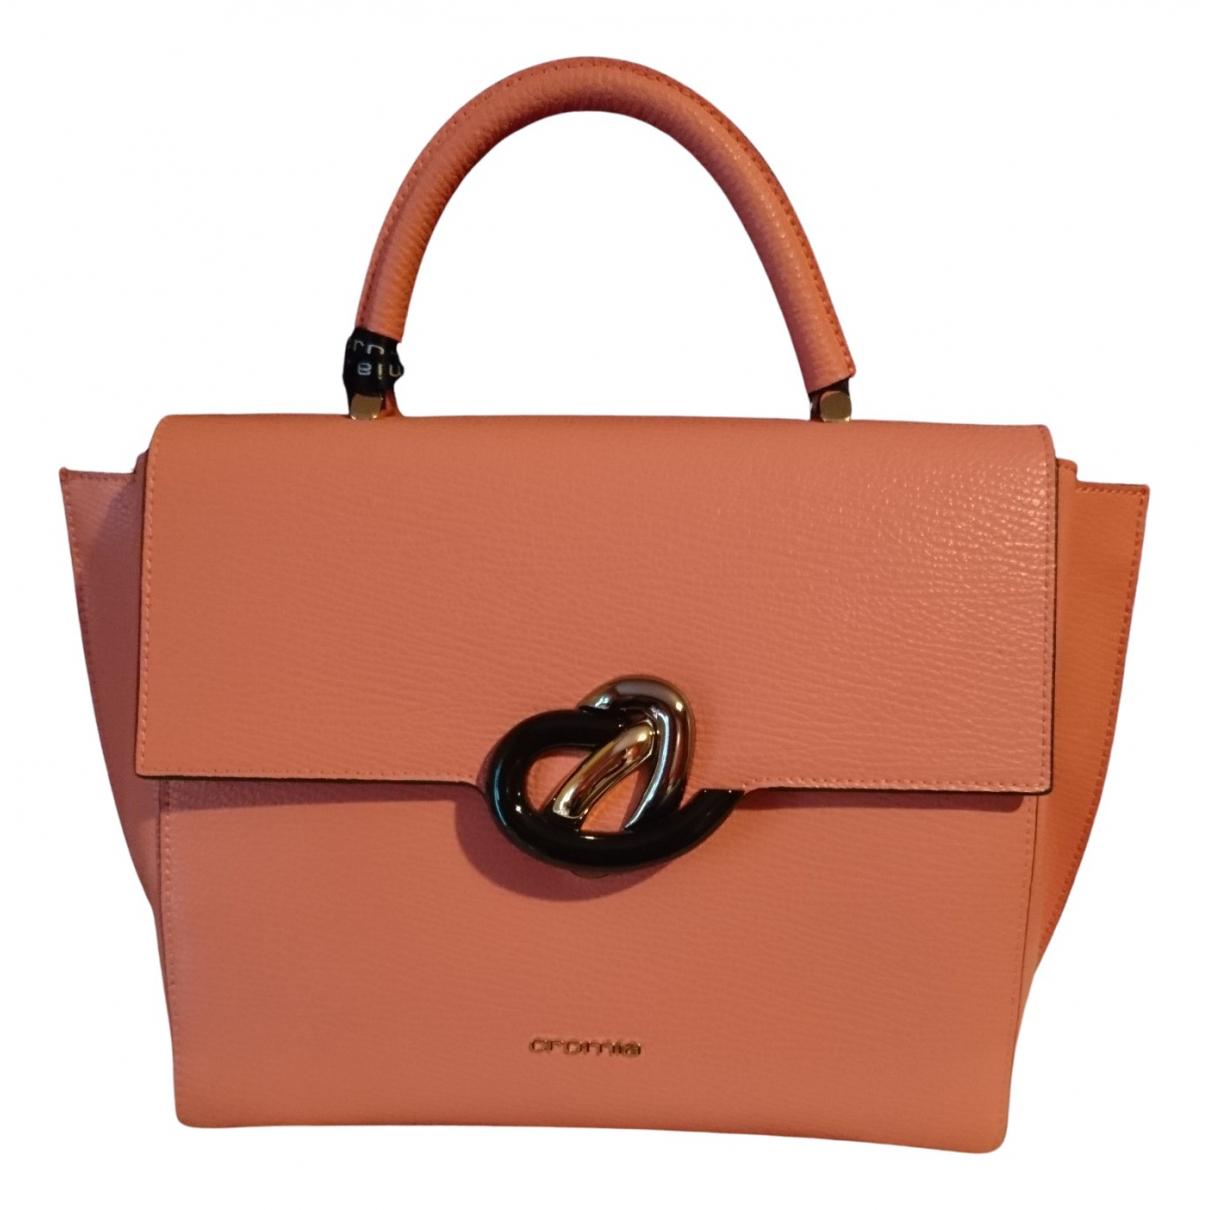 Cromia N Pink Leather handbag for Women N